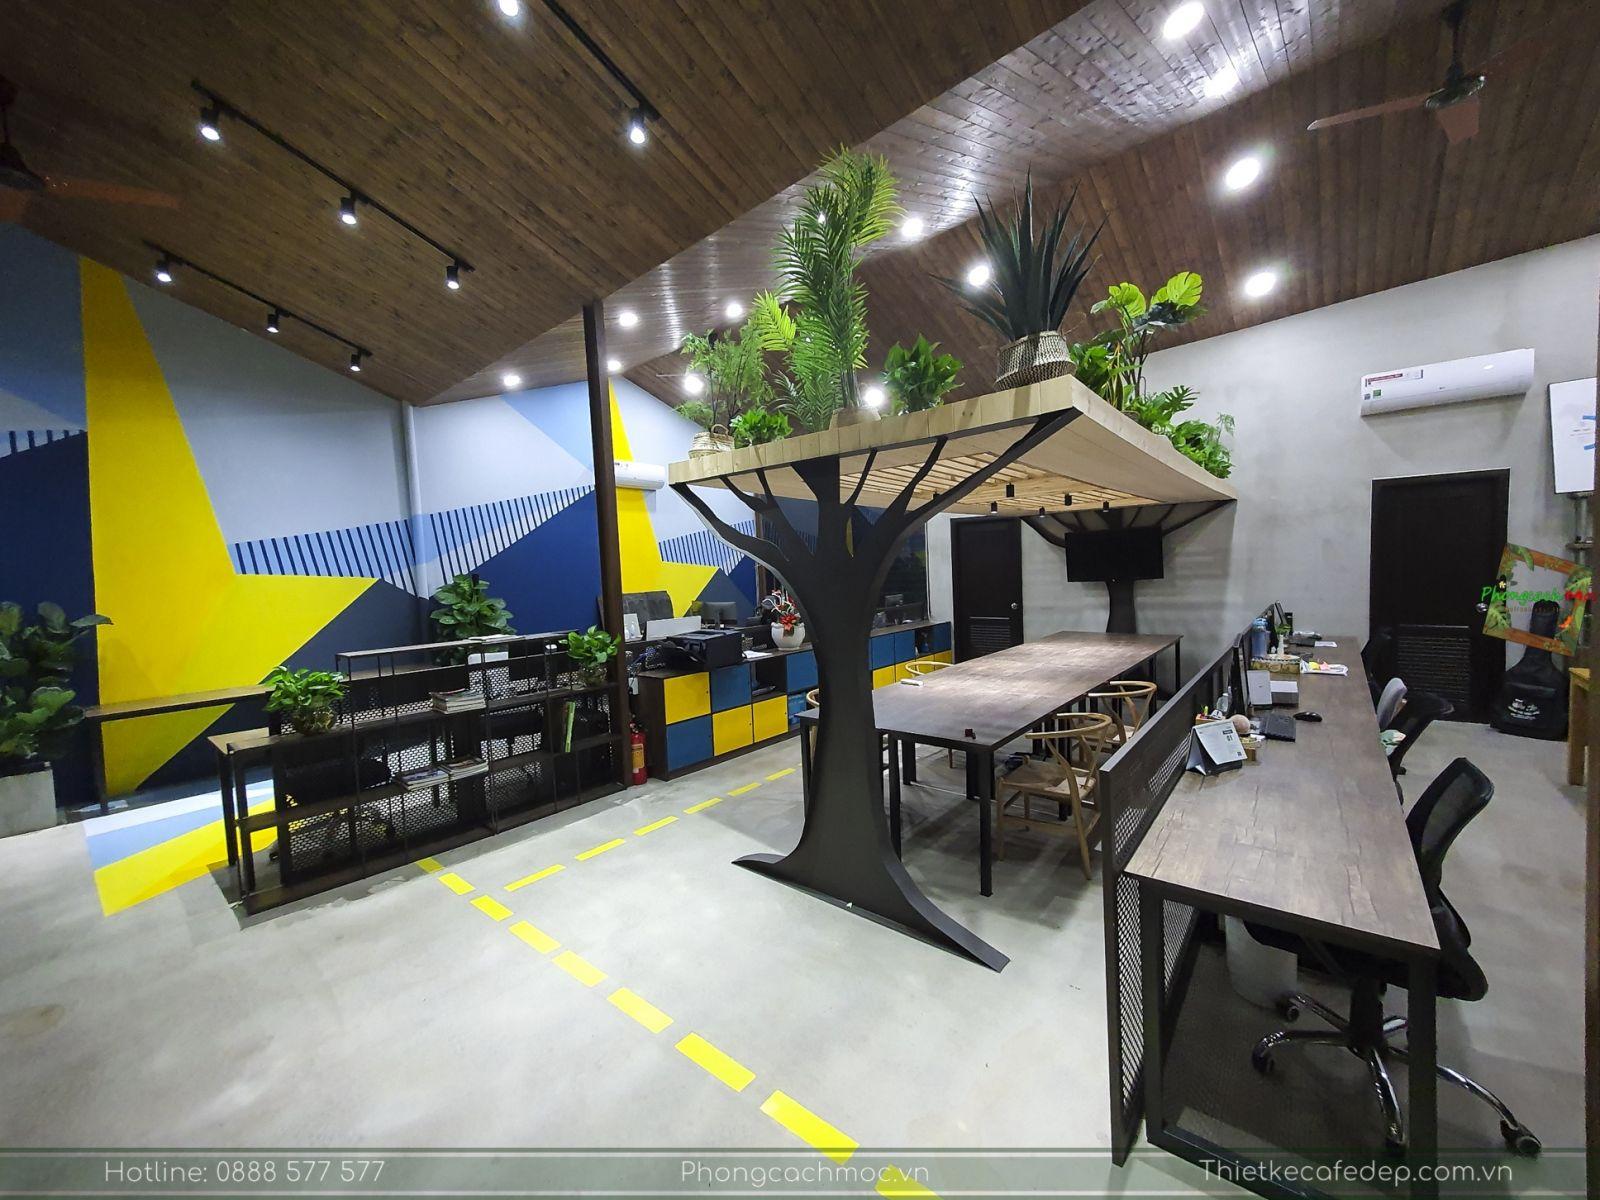 thiet-ke-thi-cong-van-phong-pcm-workshop-11